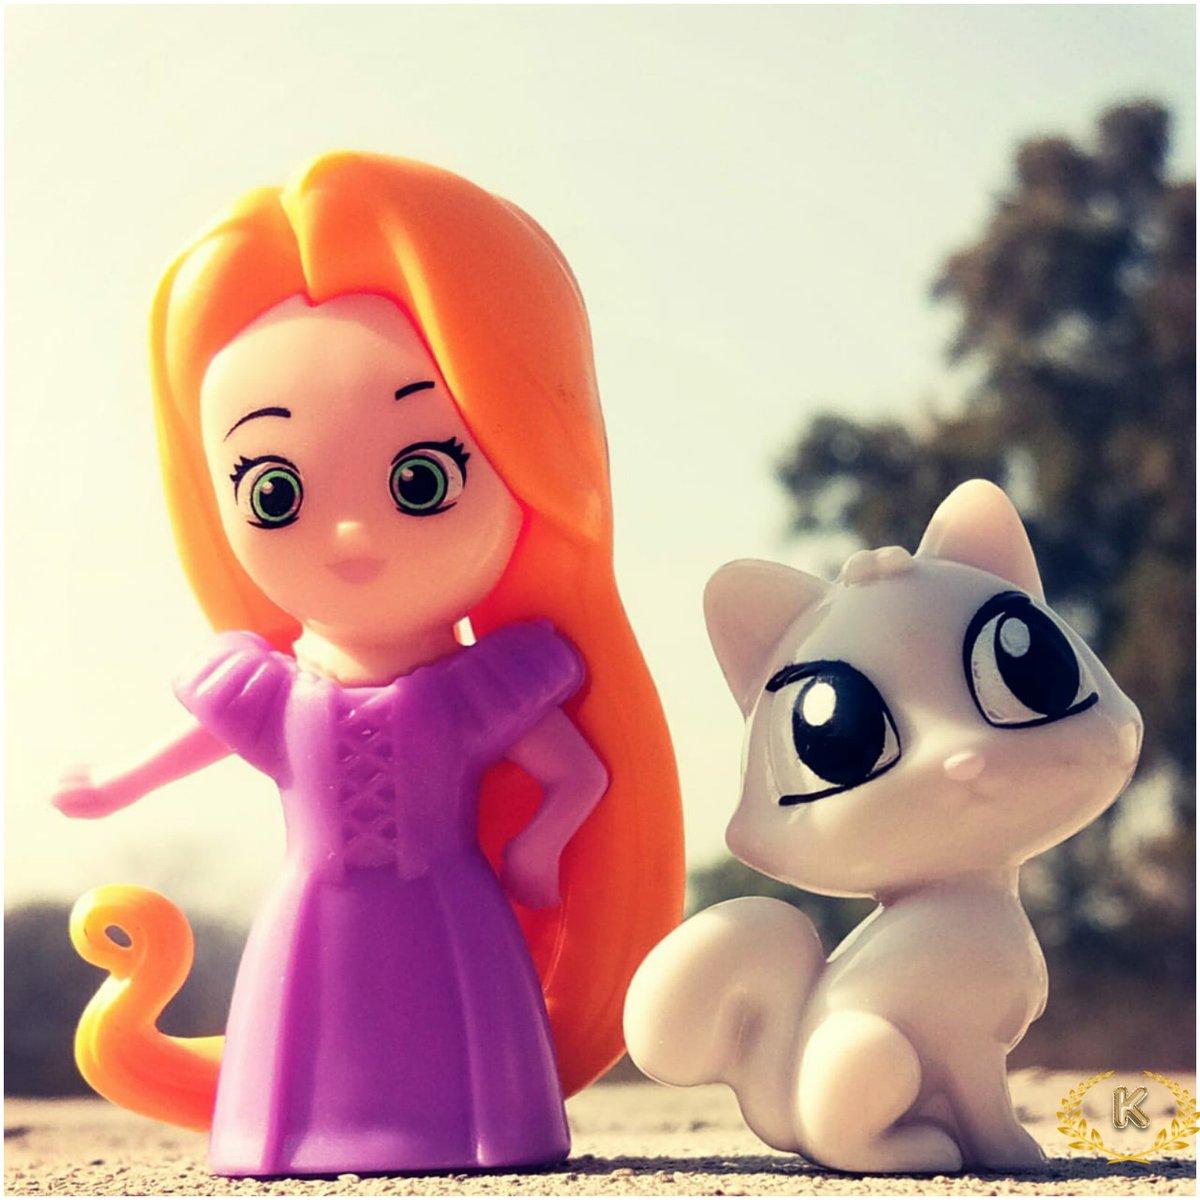 😍TOYS😍 #Kitties #Rapunzel #PicOfTheDay #click #doll #toys #photograghy #binod 🐈🐈